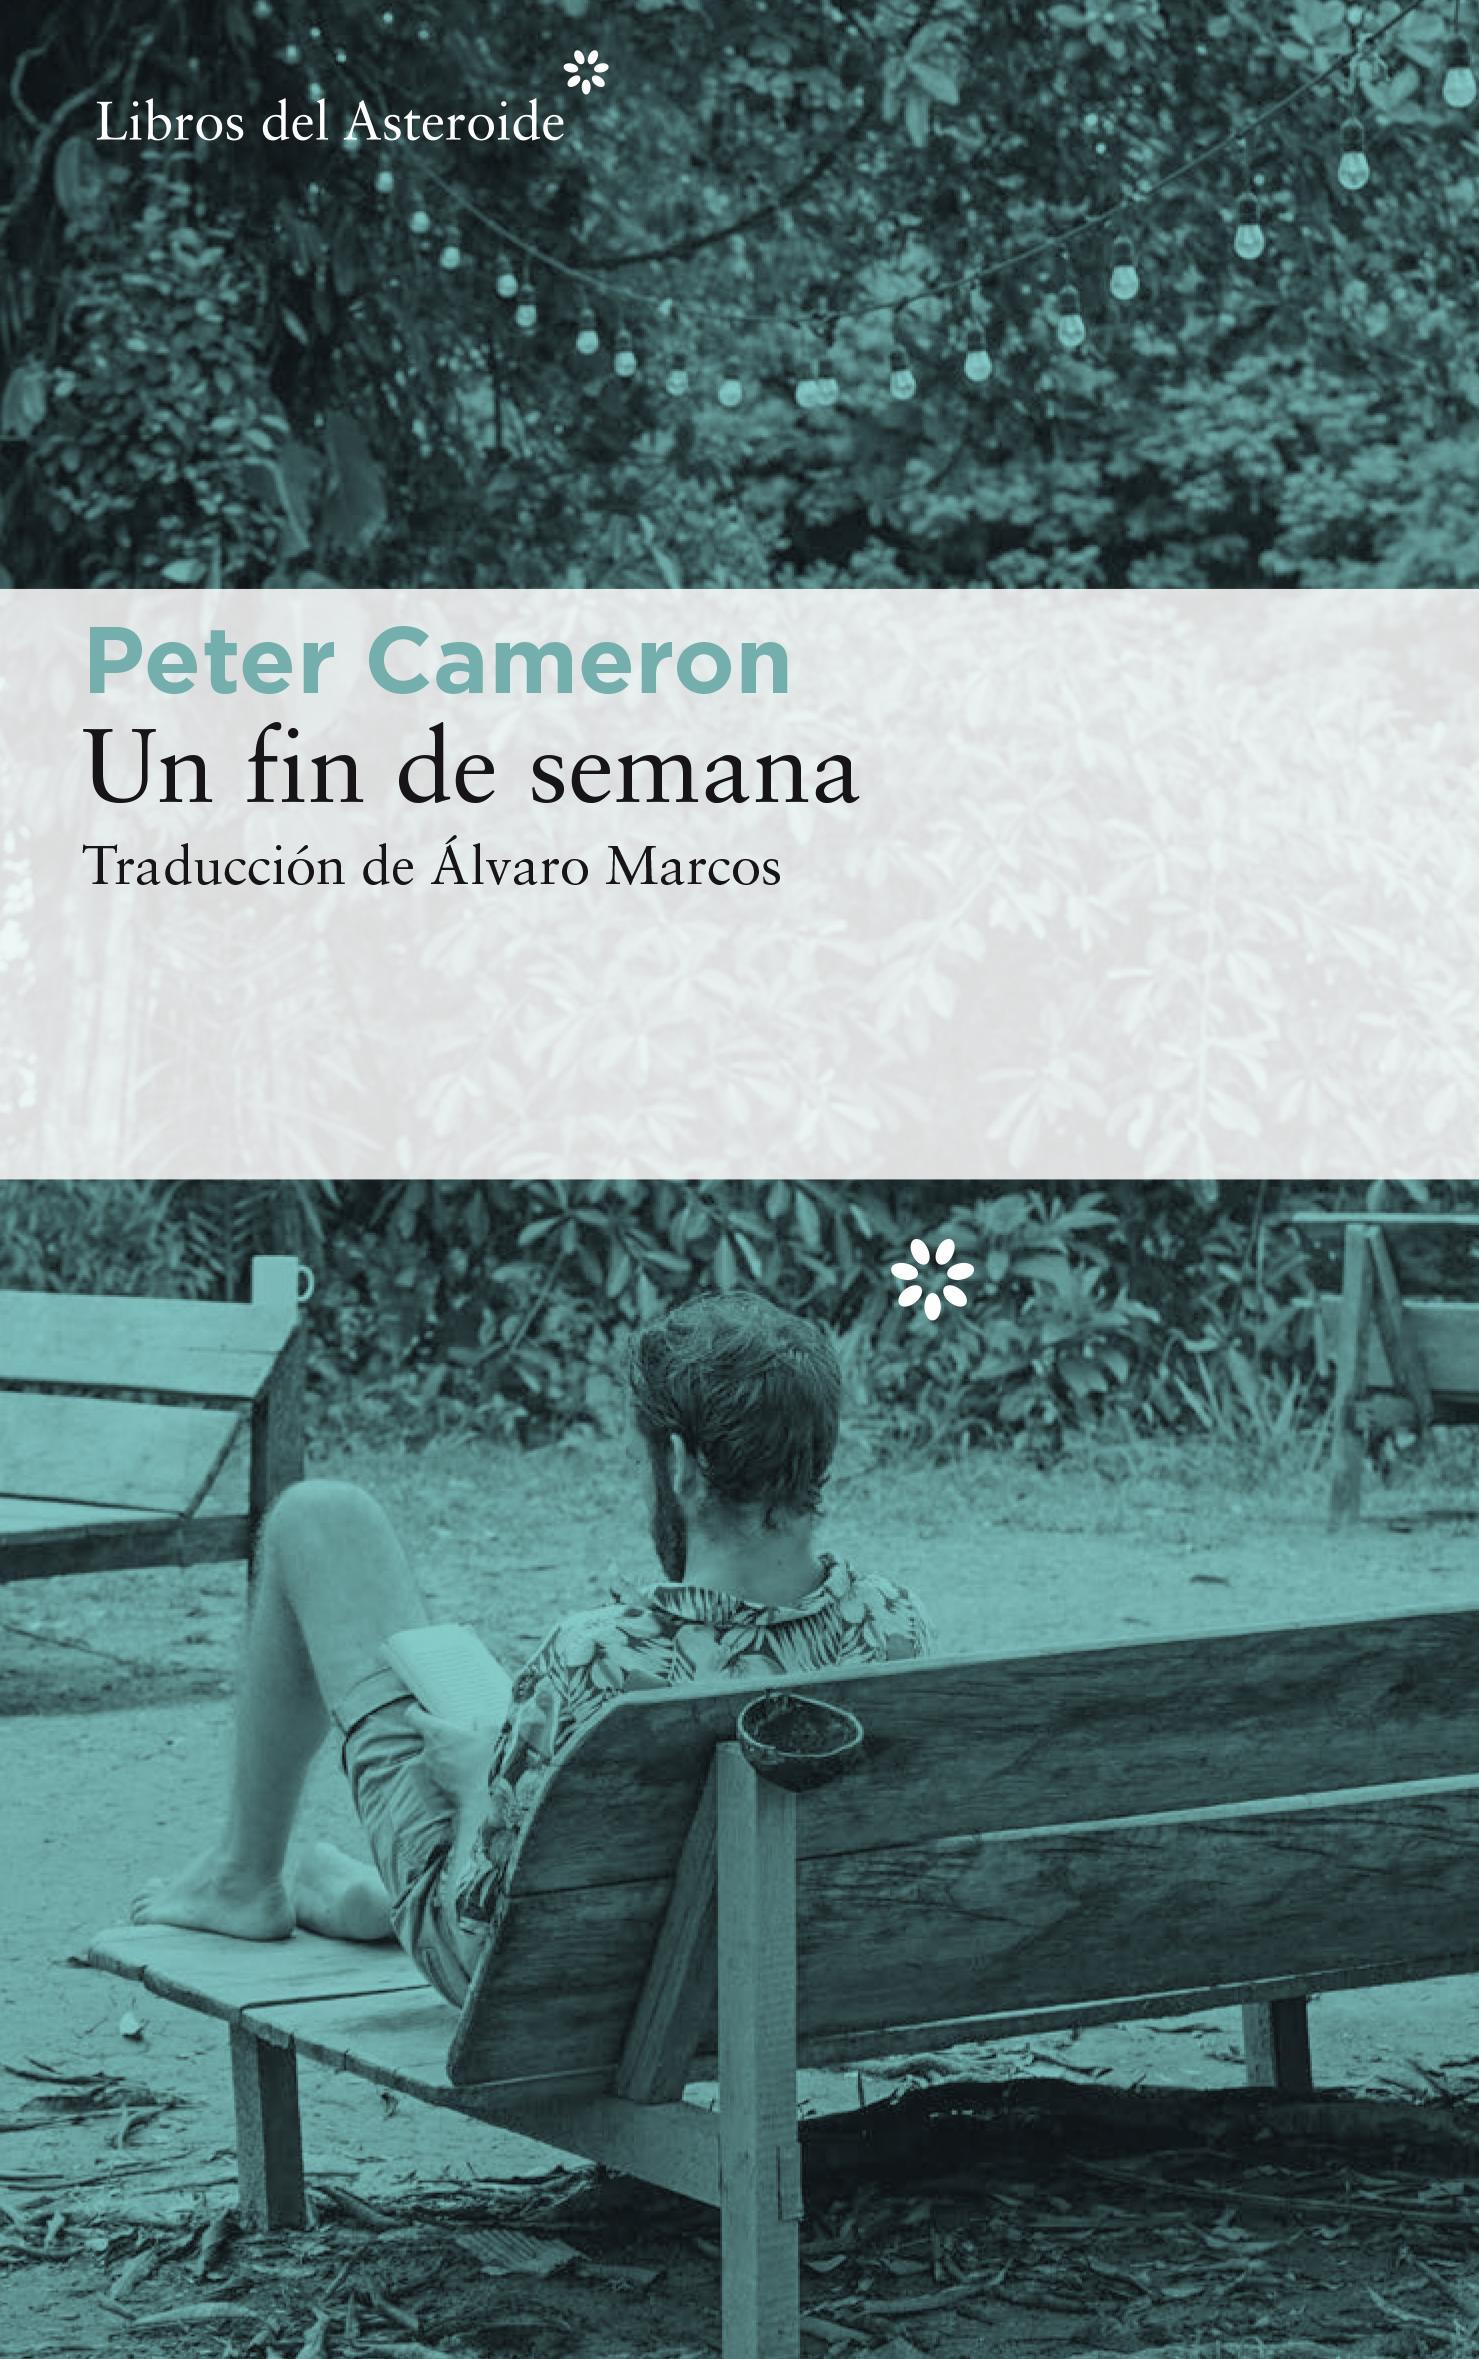 Portada del libro Un fin de semana de Peter Cameron.